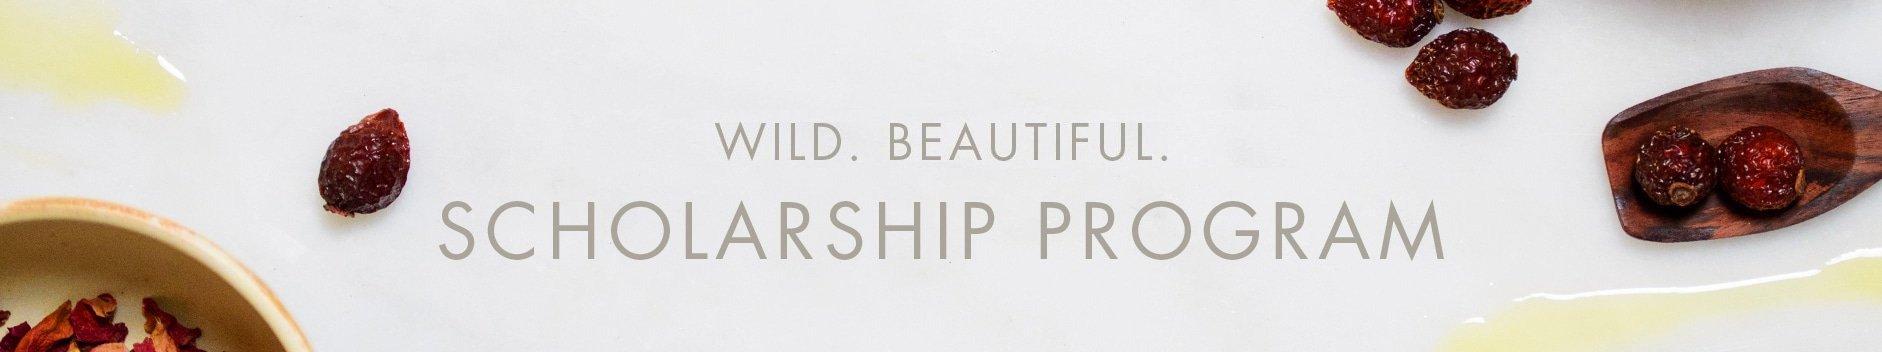 wild-beautiful-scholarship-program